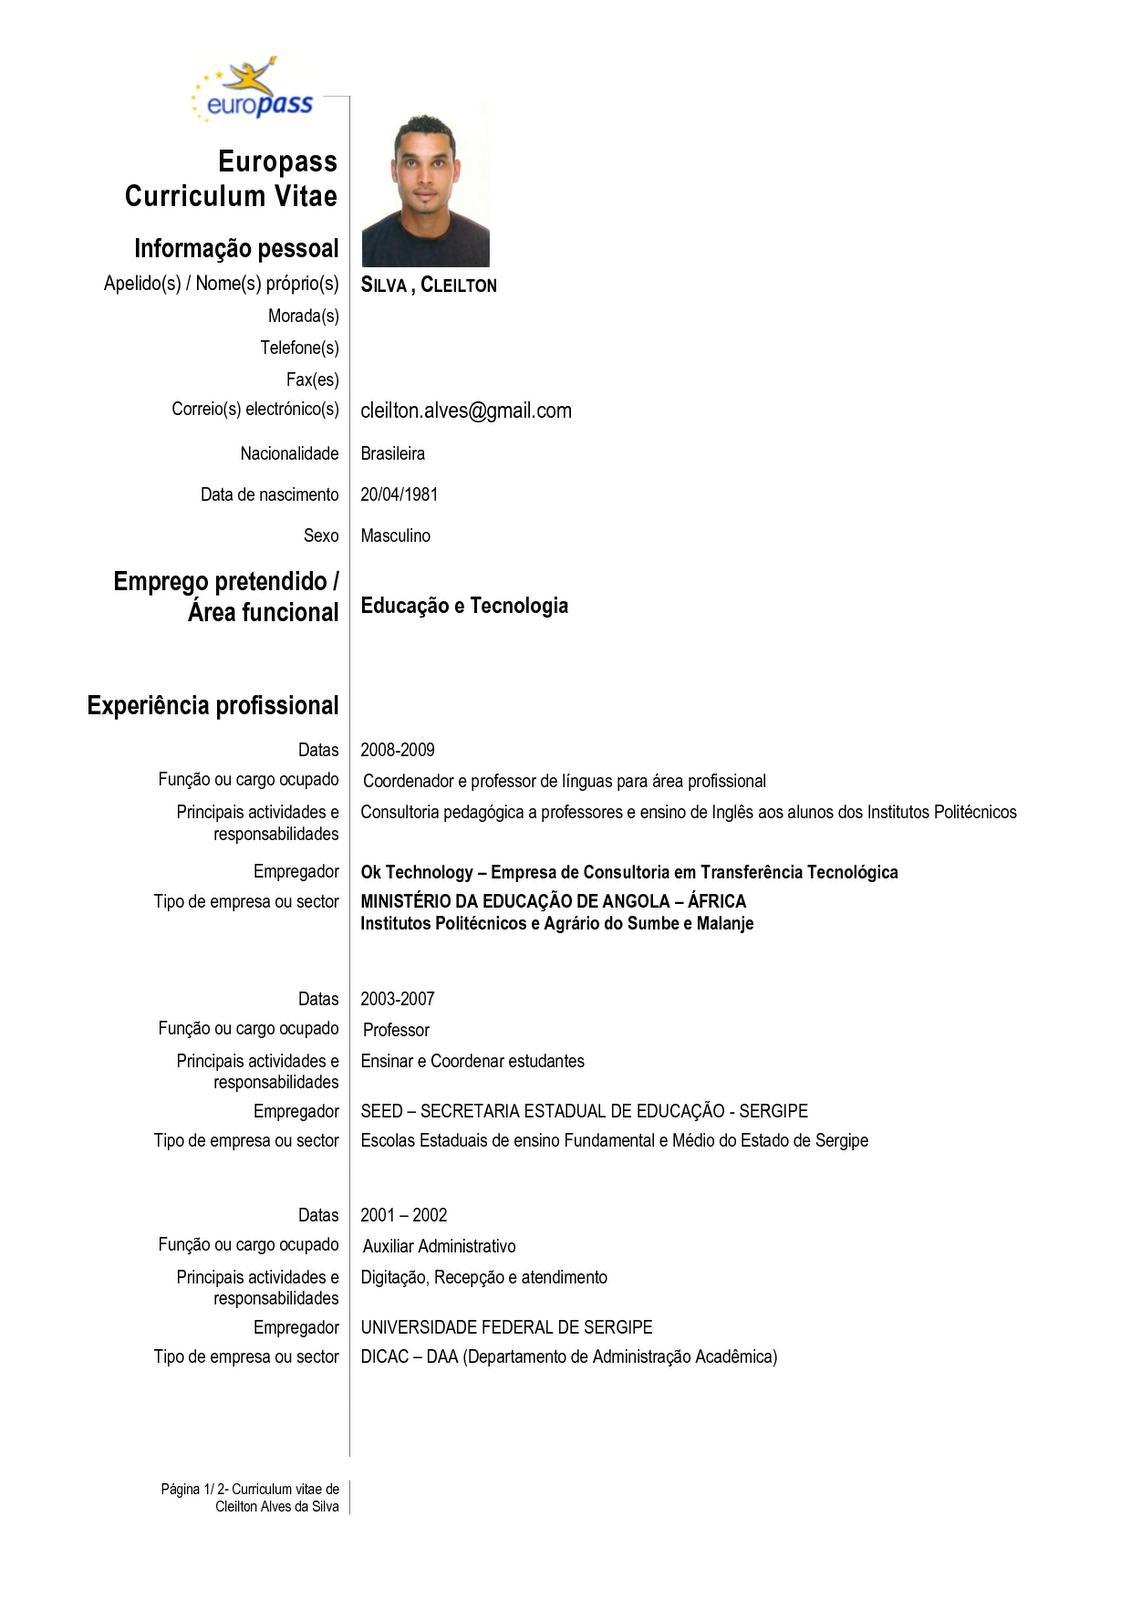 curriculum vitae formato europeo per praticanti avvocati